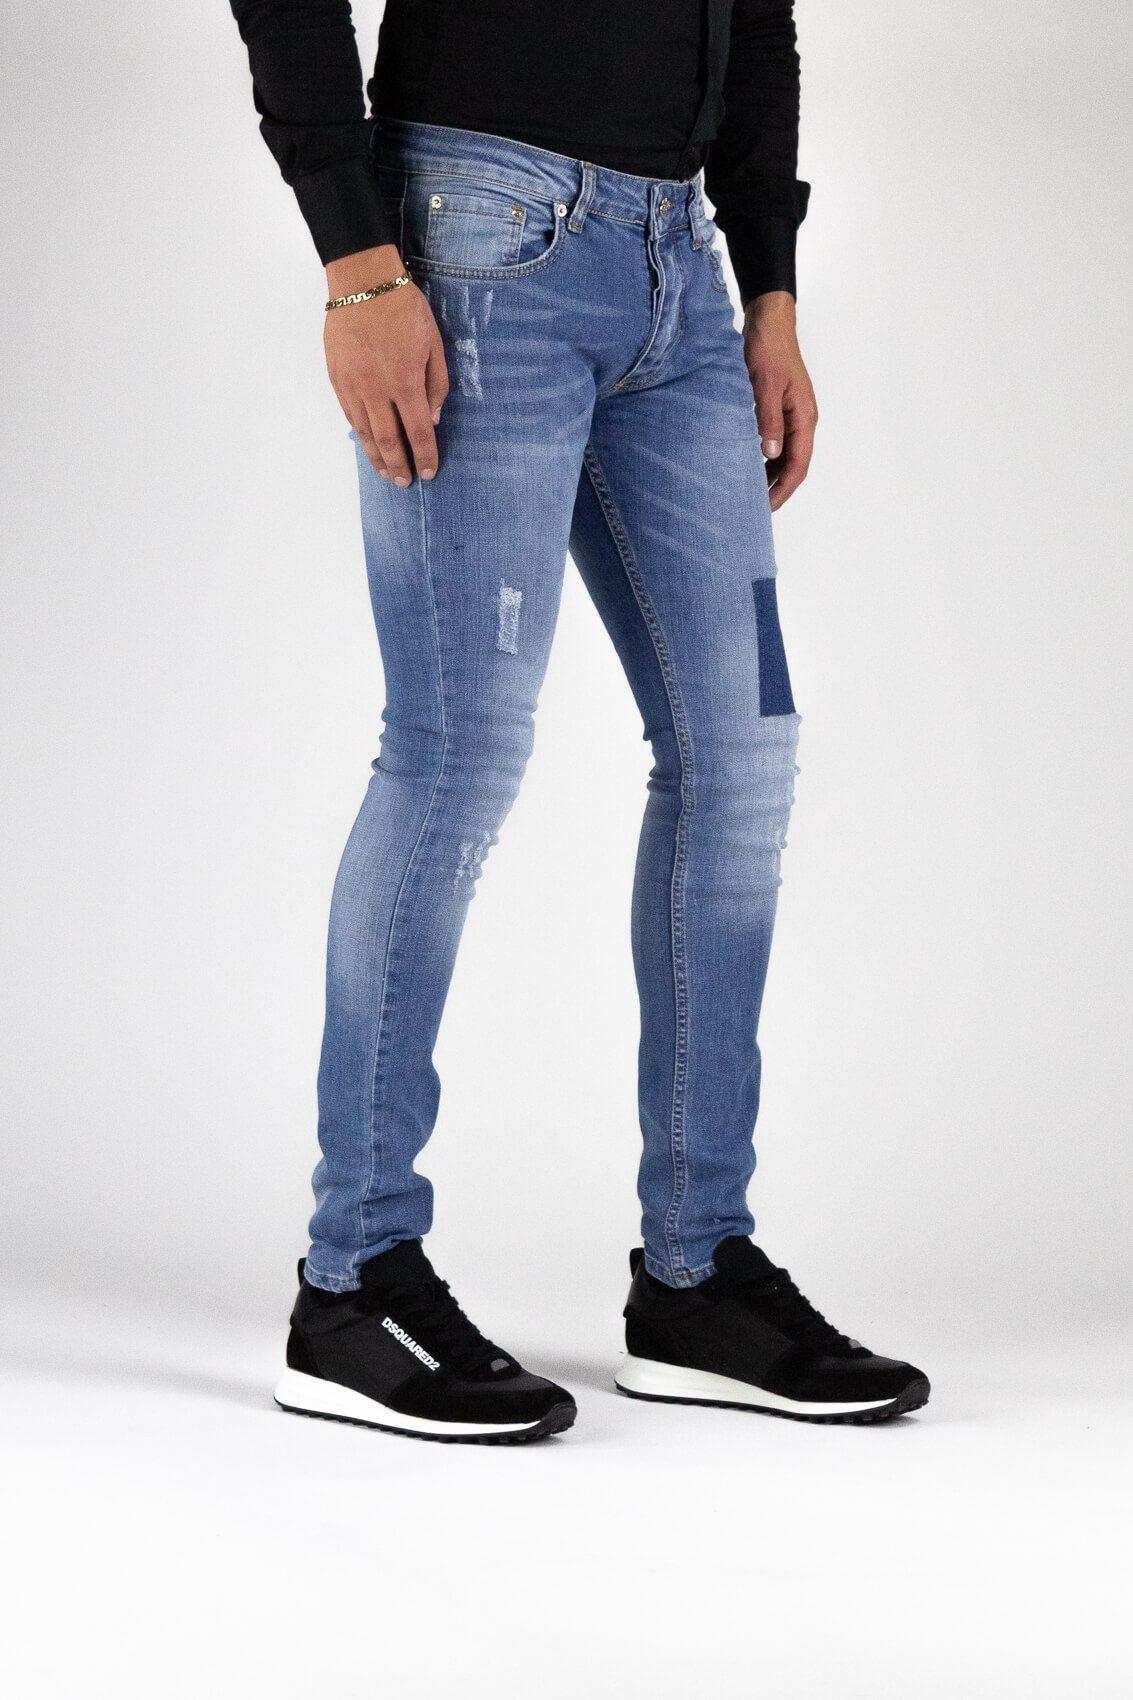 Marseille Bleu Clair Jeans 2